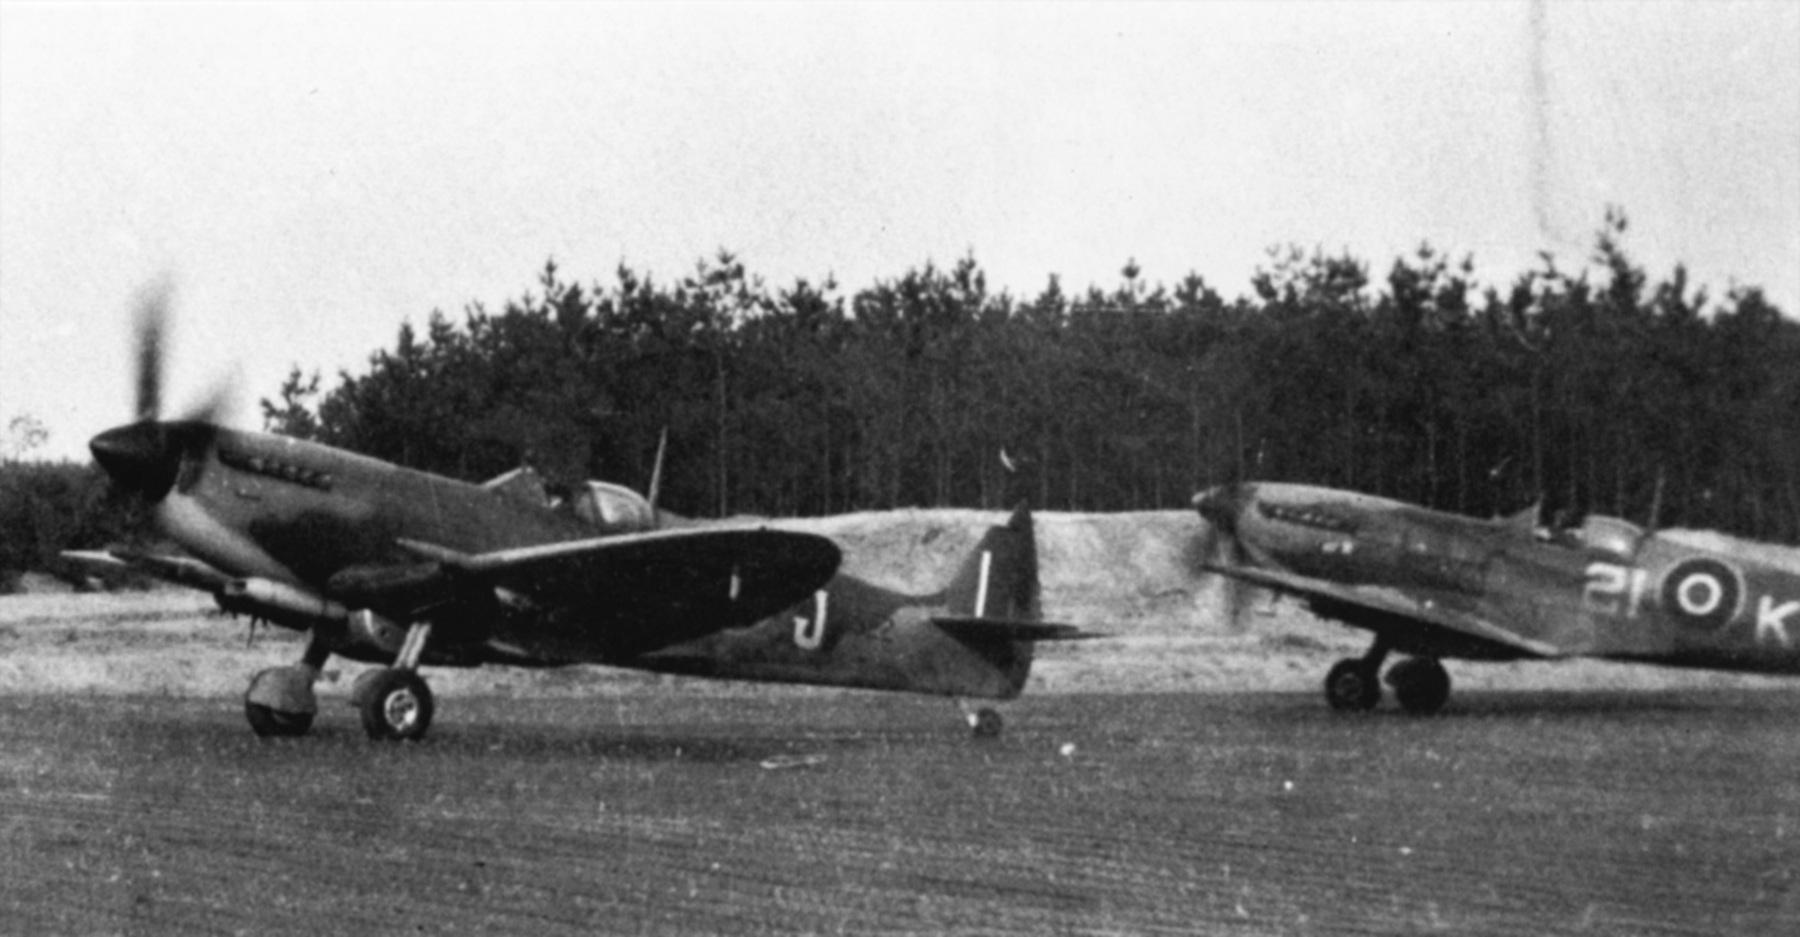 Spitfire MkIX RCAF 443Sqn 2IJ and 2IK 01